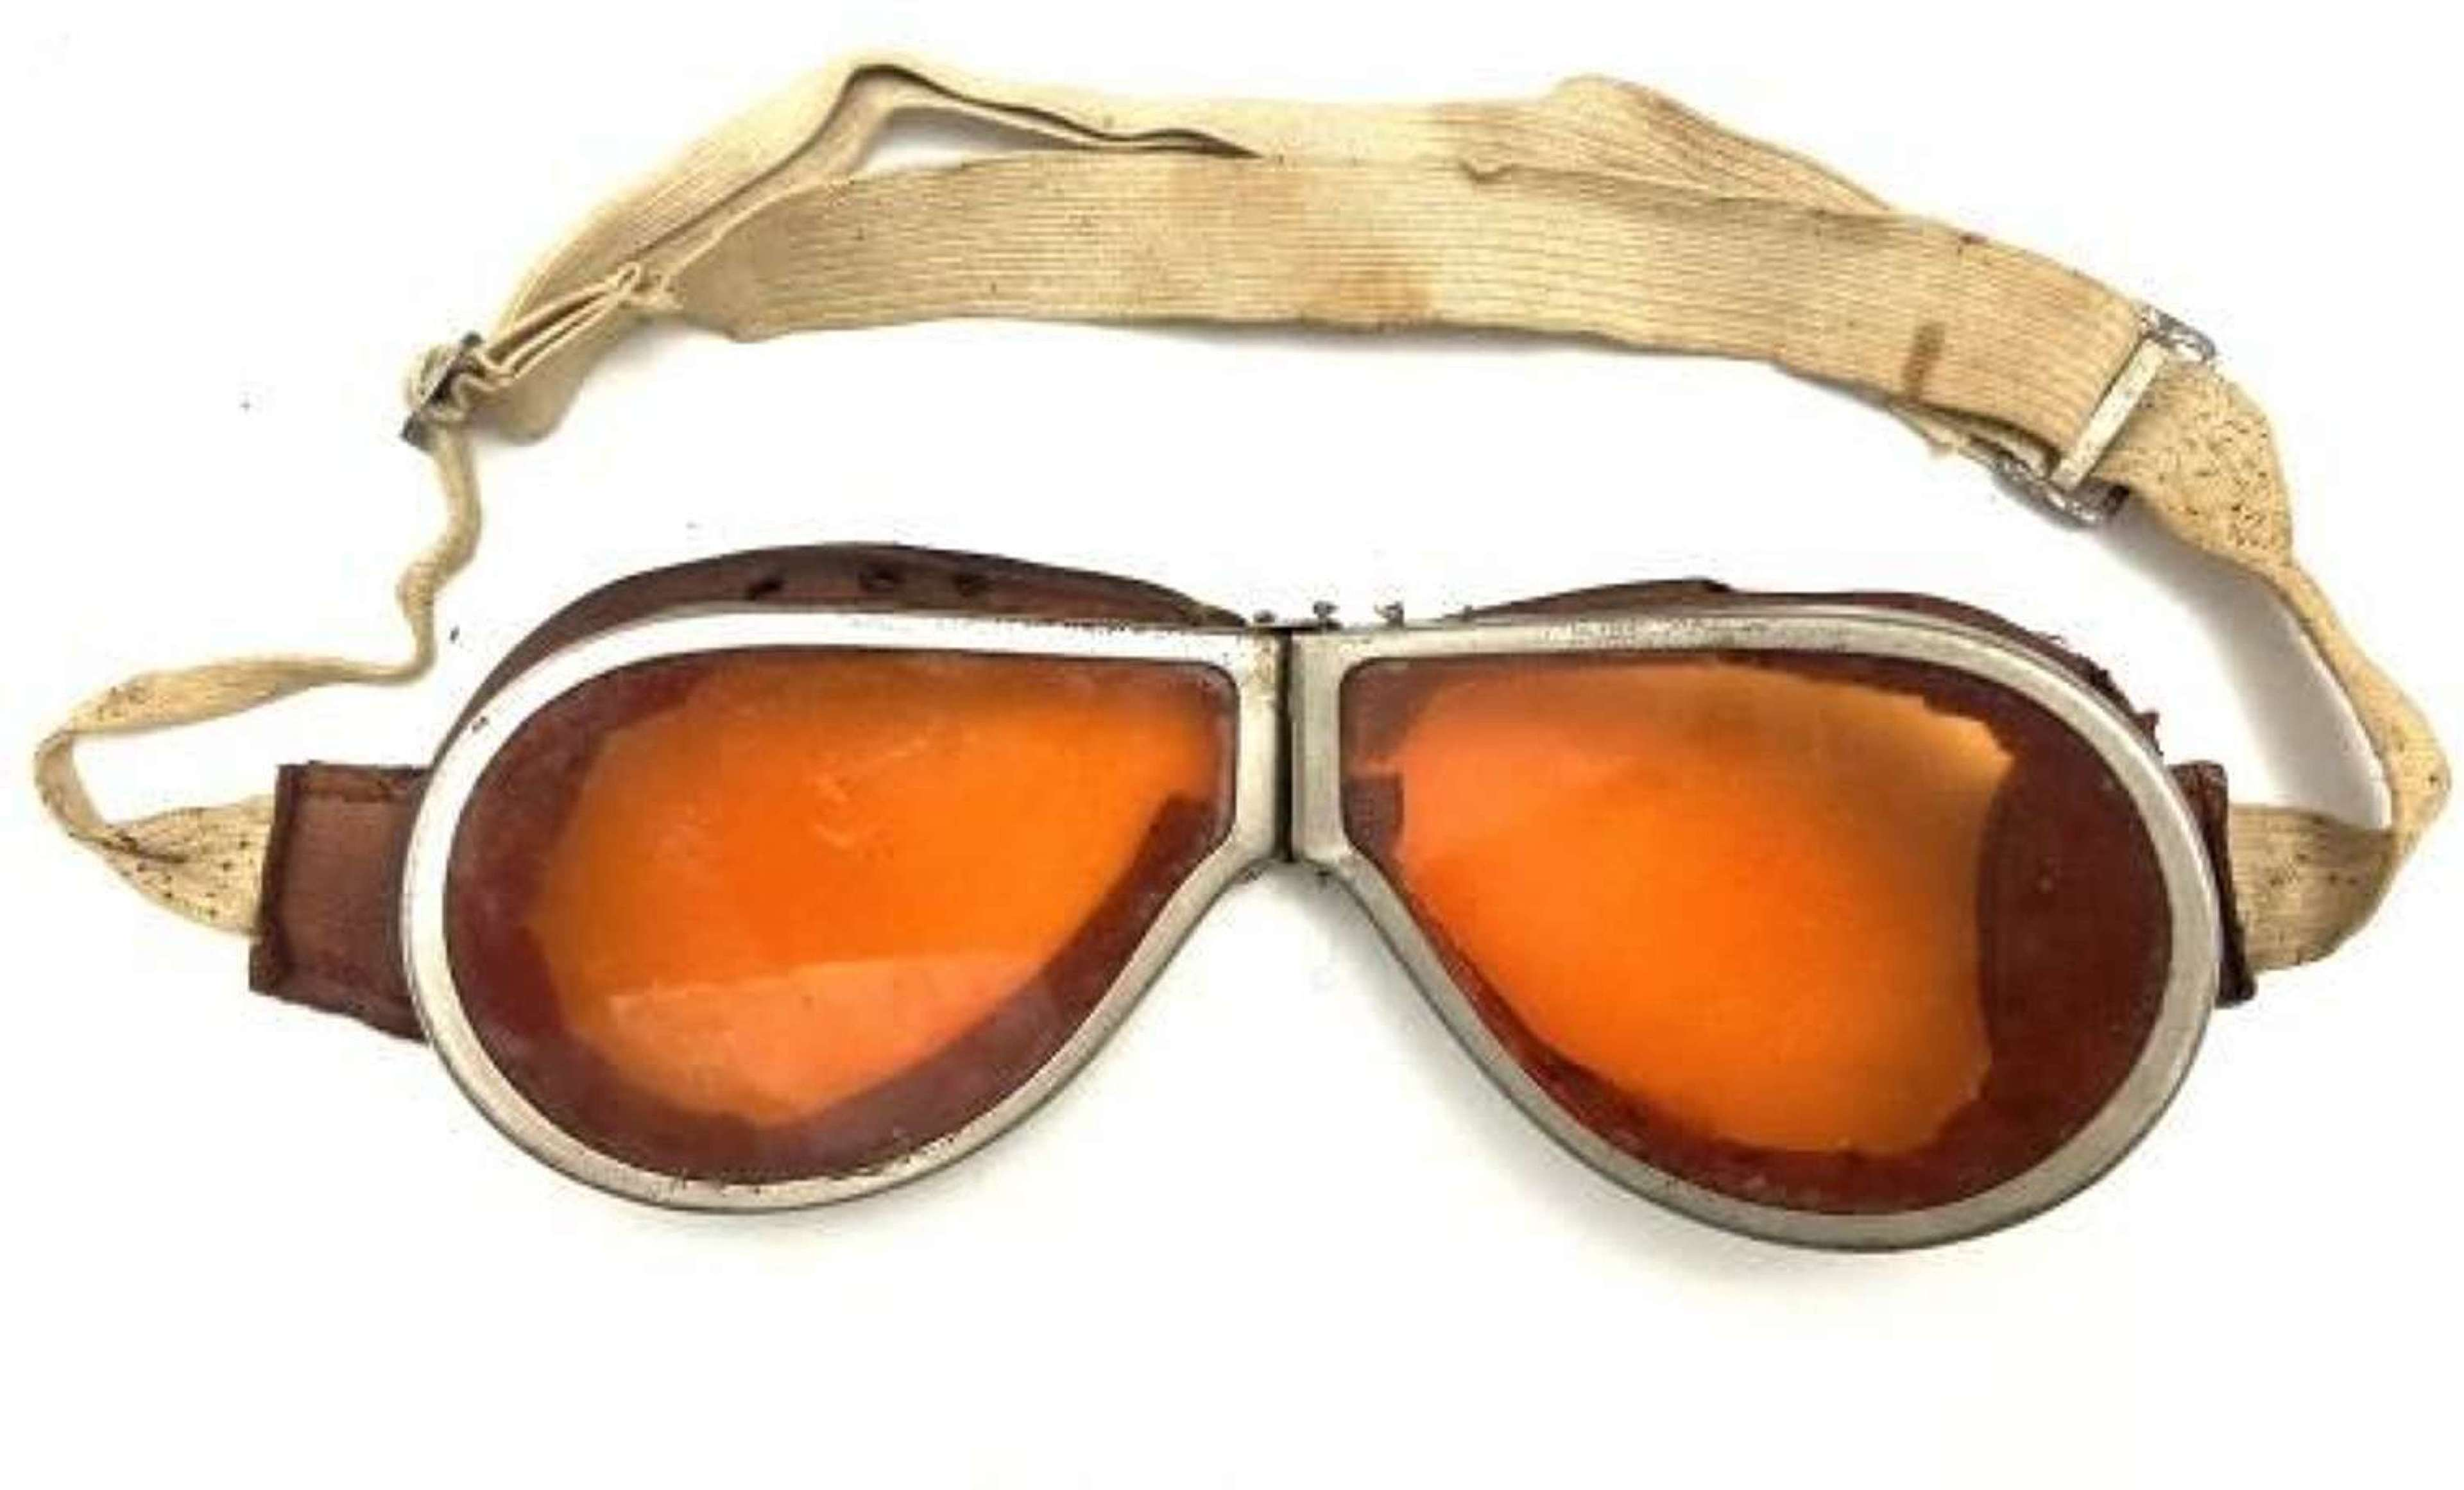 Original WW2 British MT Goggles with Tinted Lenses